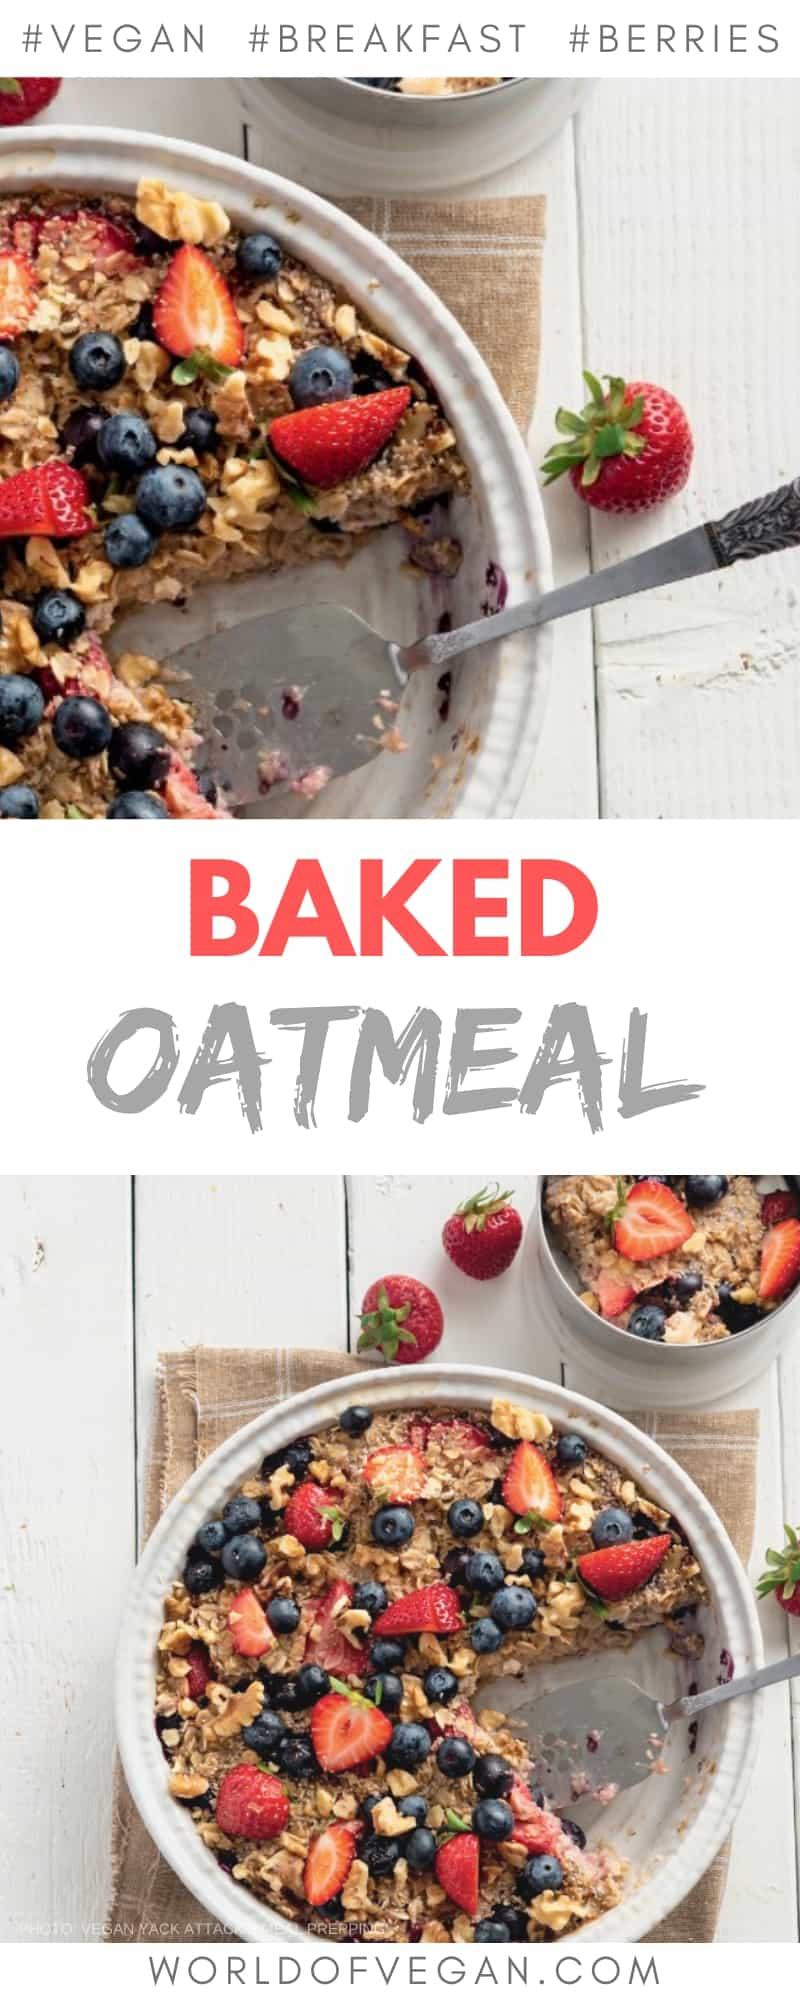 Baked Oatmeal with Berries | Easy Vegan Breakfast | World of Vegan | #breakfast #oatmeal #vegan #berries #baked #easy